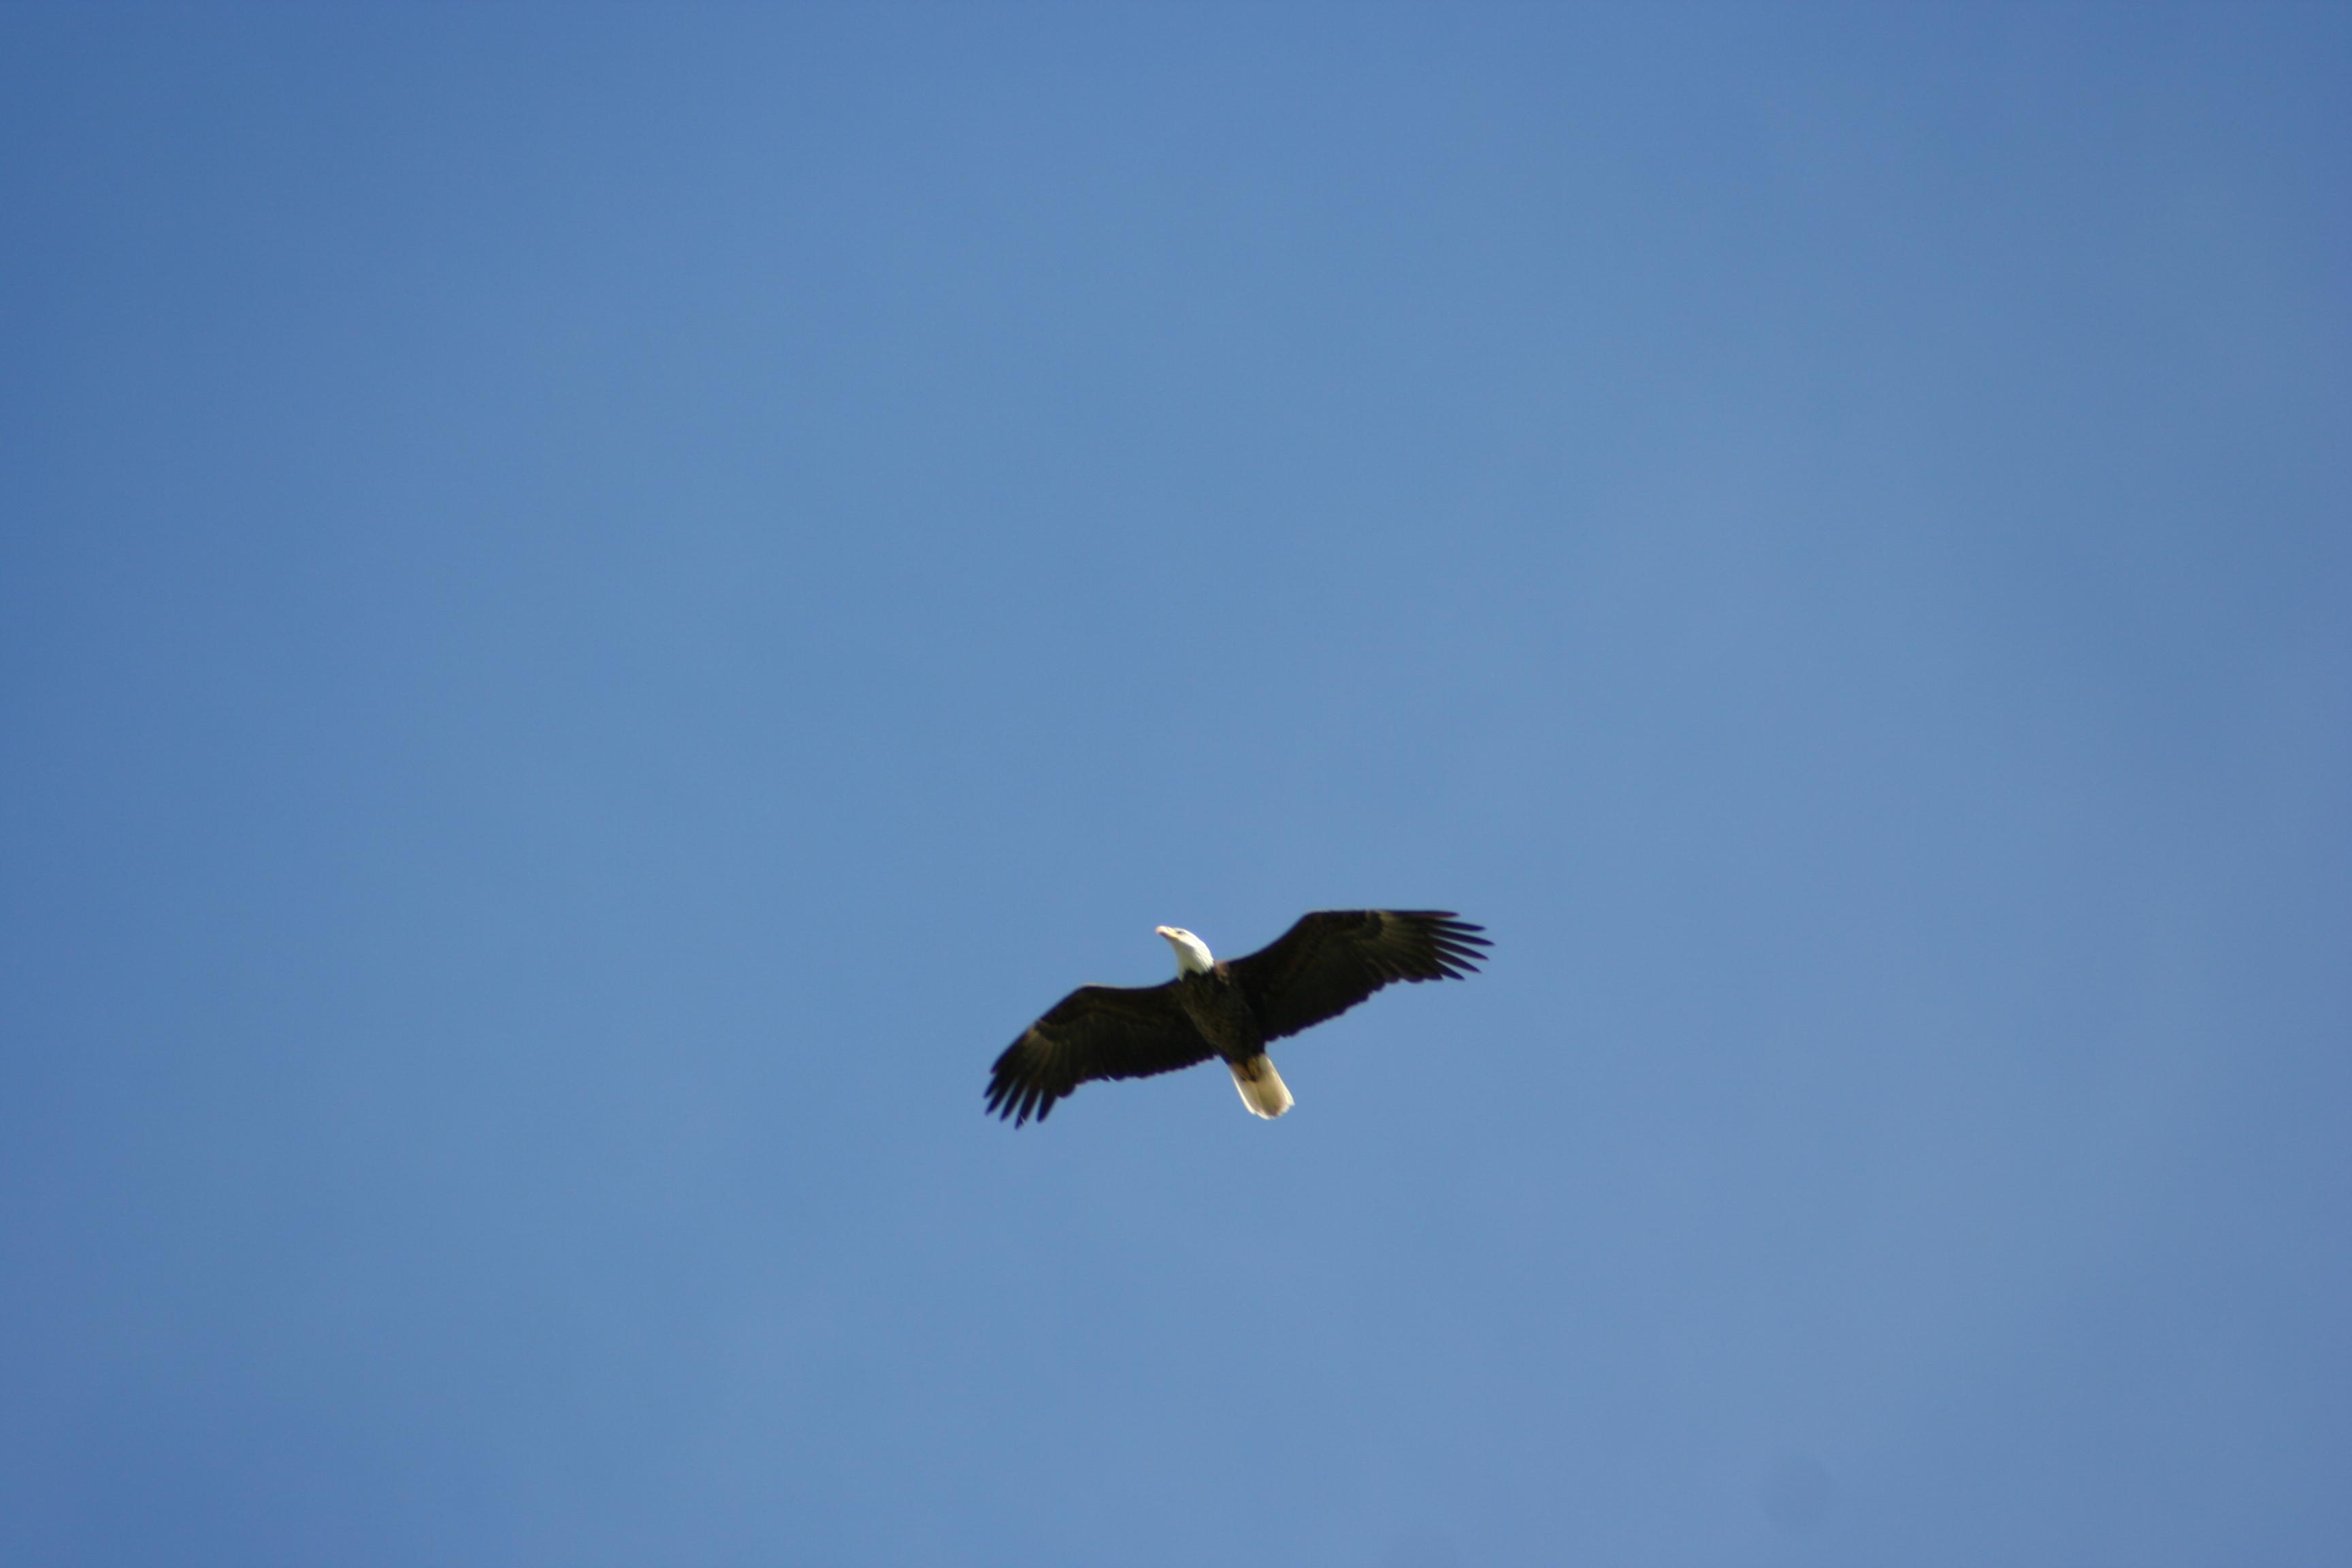 Bald eagles in flight - photo#20